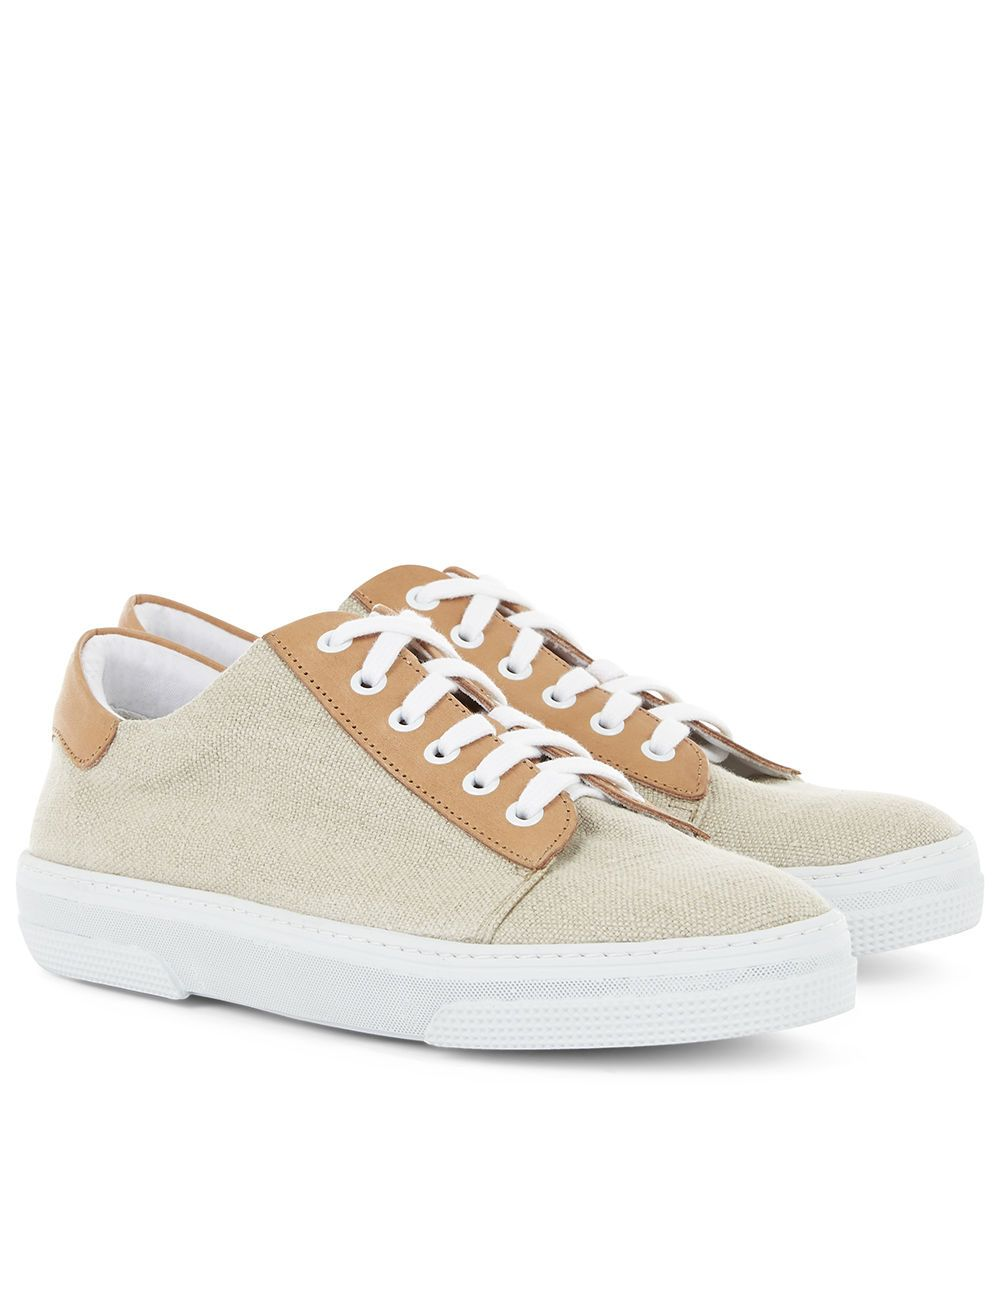 Bi-Colour Linen Low-Top Sneakers